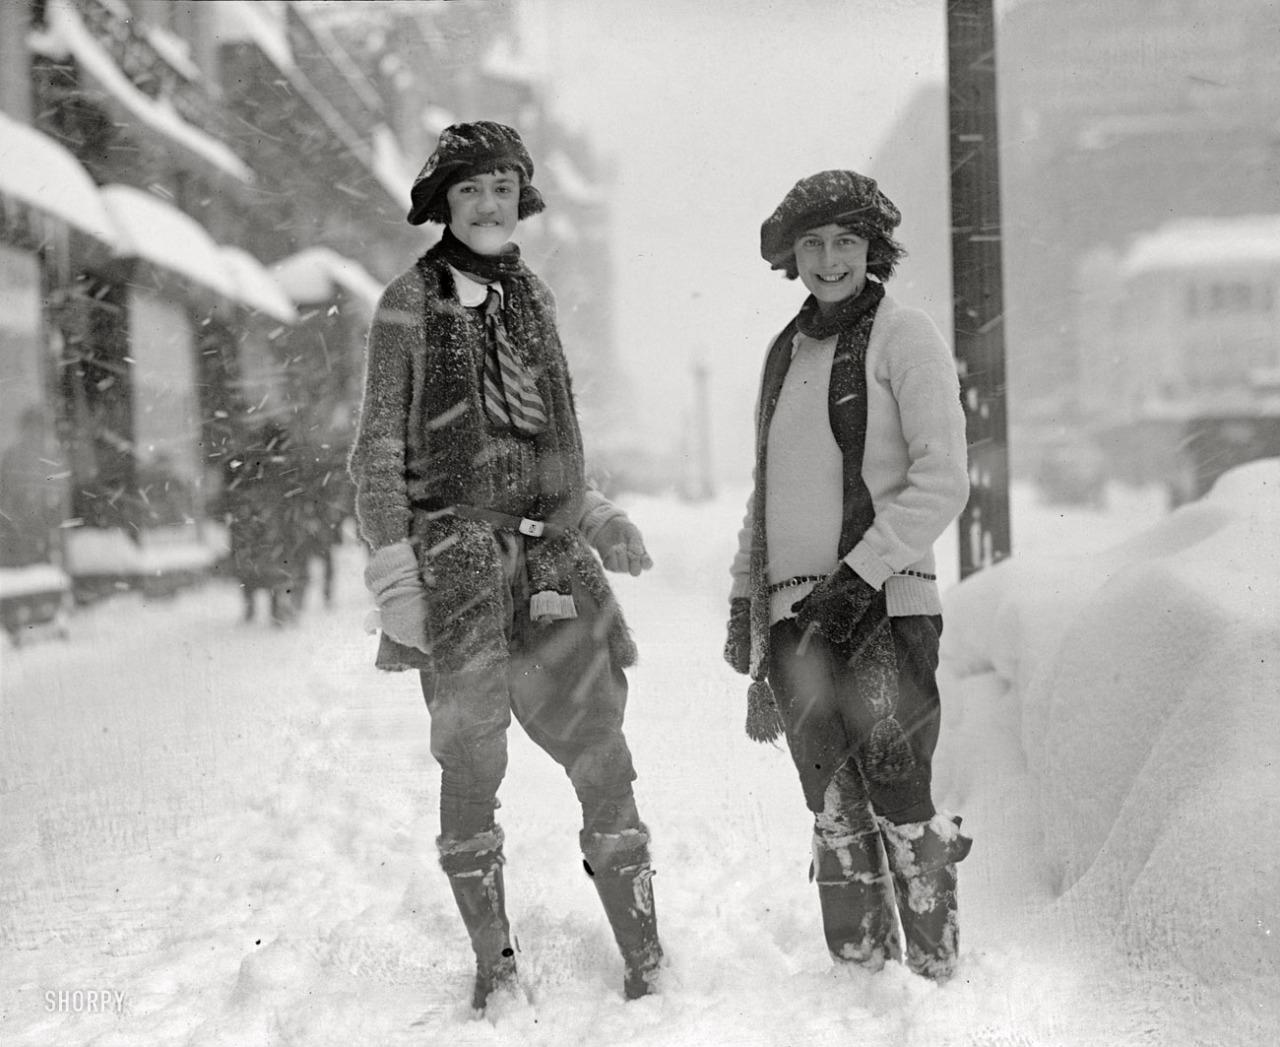 36 Vintage Photos Show A Unique And Elegant Style Of 1920s